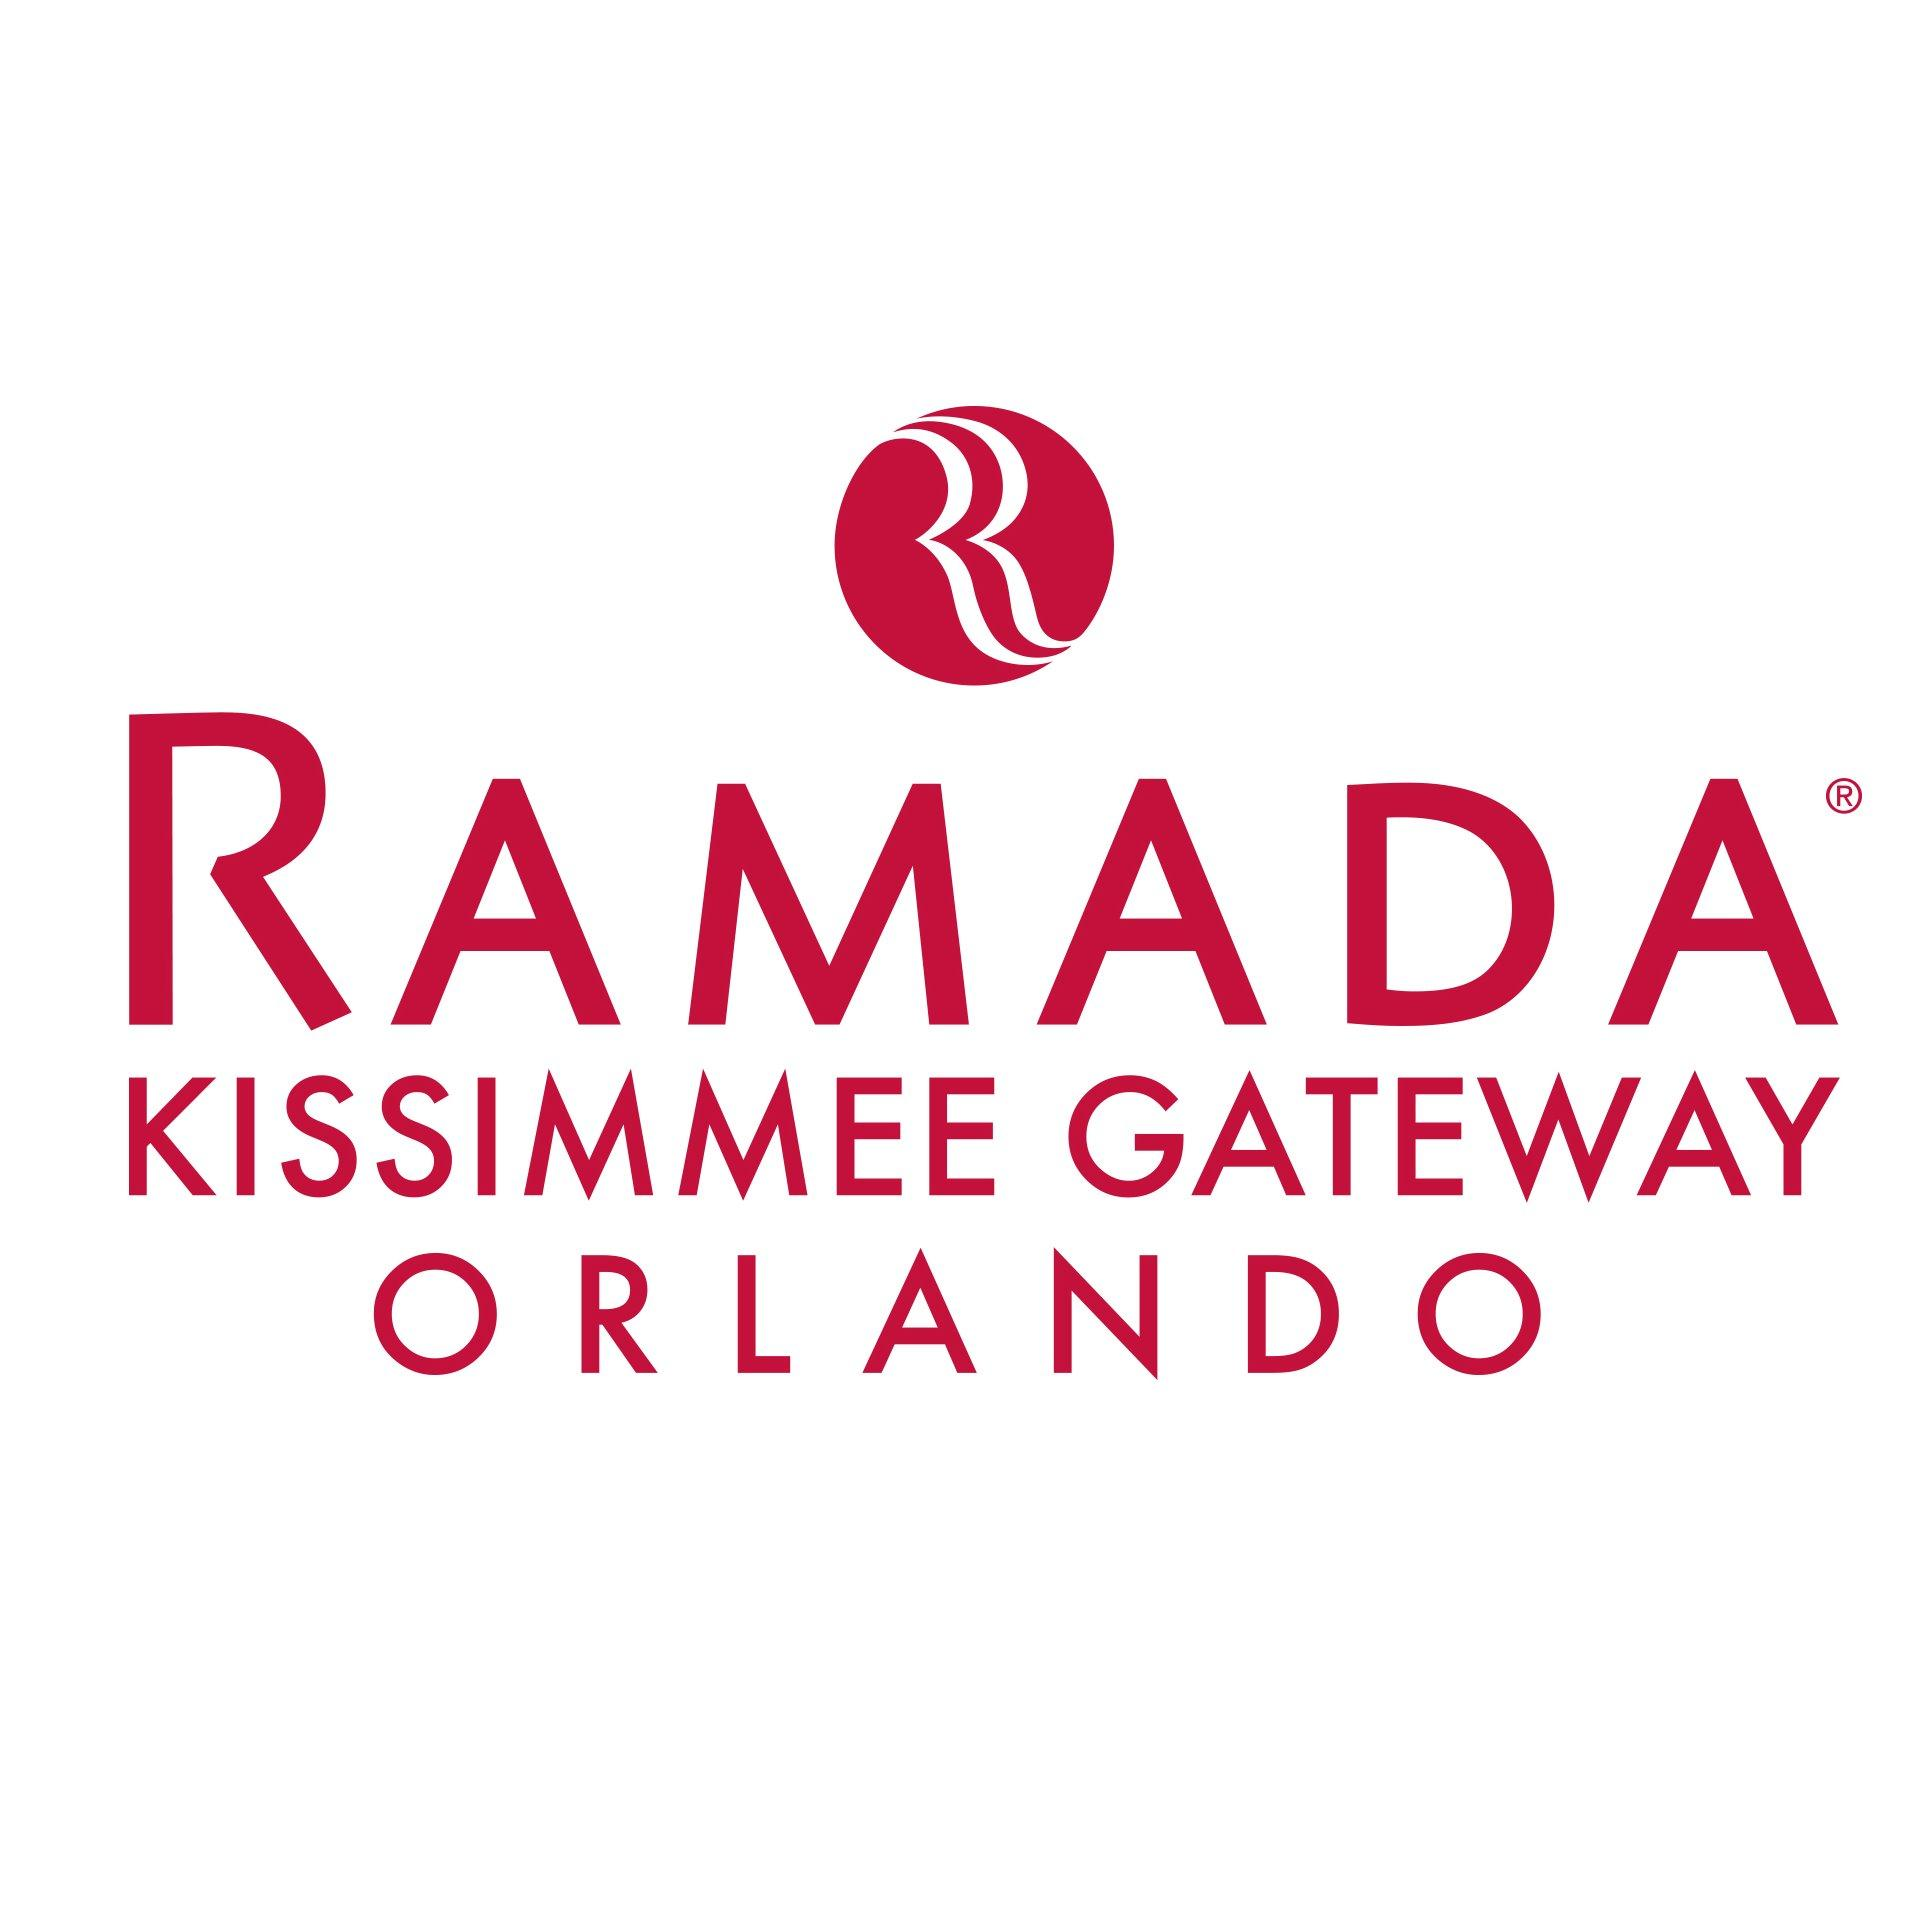 Ramada Kissimmee Gateway Orlando